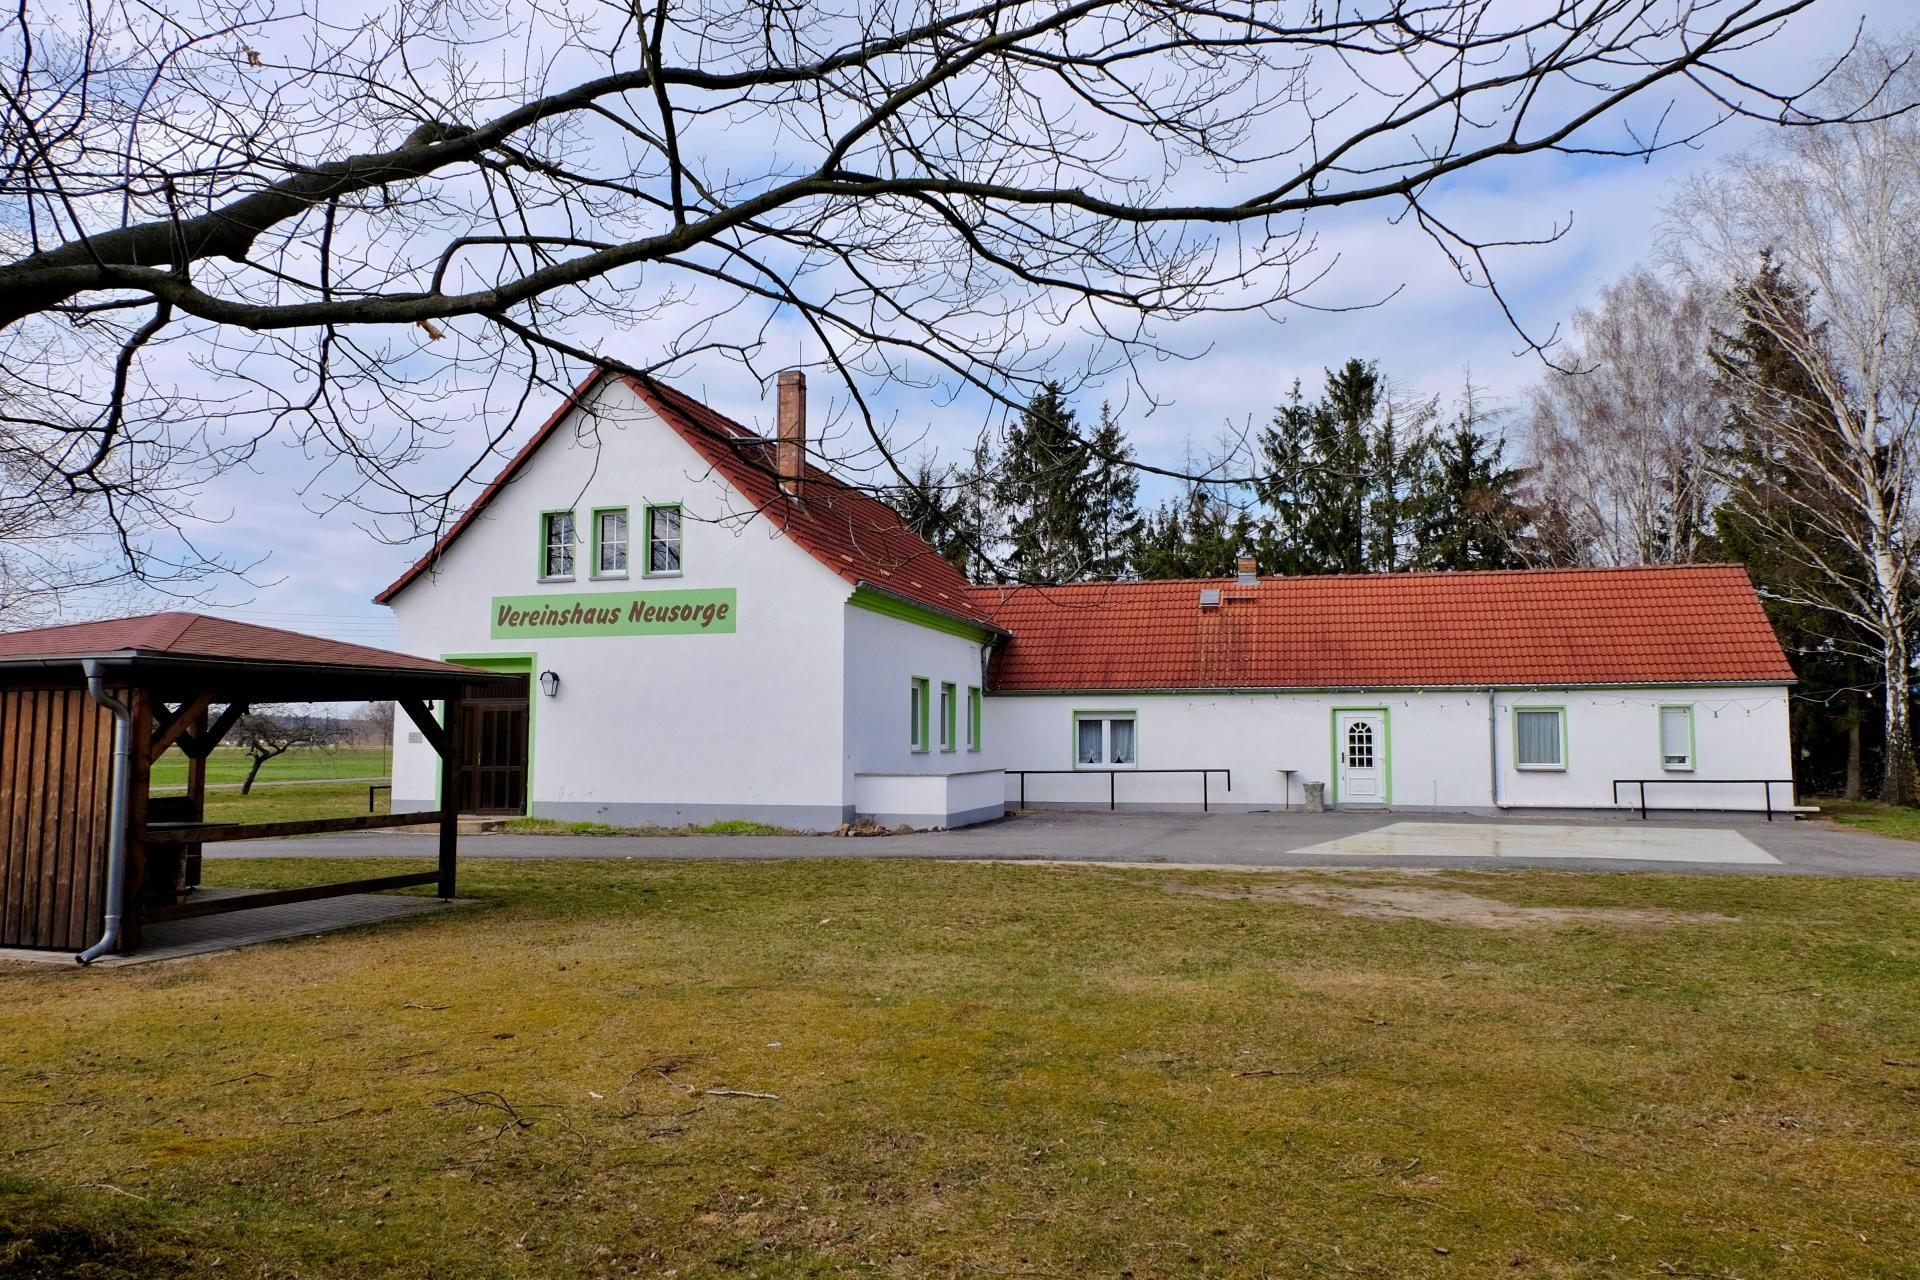 Vereinhaus Neusorge ©Stephan Peereboom